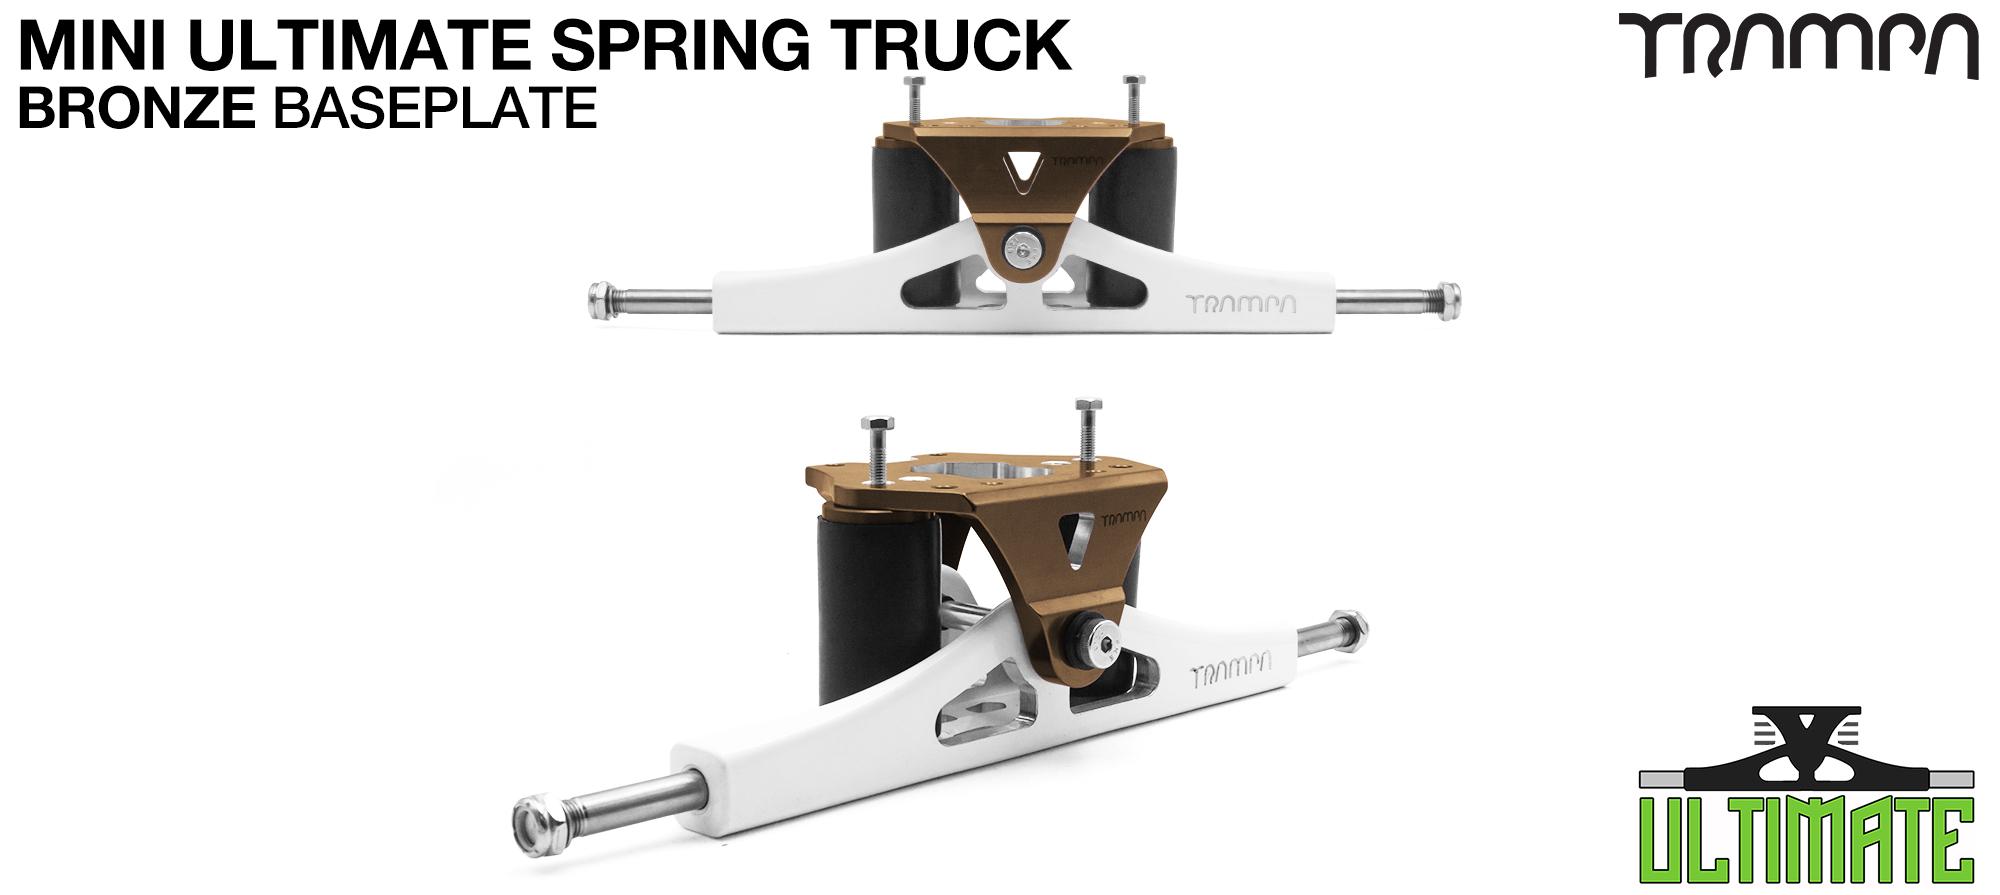 Mini ULTIMATE TRAMPA TRUCKS - CNC FORGED Channel Hanger with 9.525mm TITANIUM Axle CNC Baseplate TITANIUM Kingpin - BRONZE